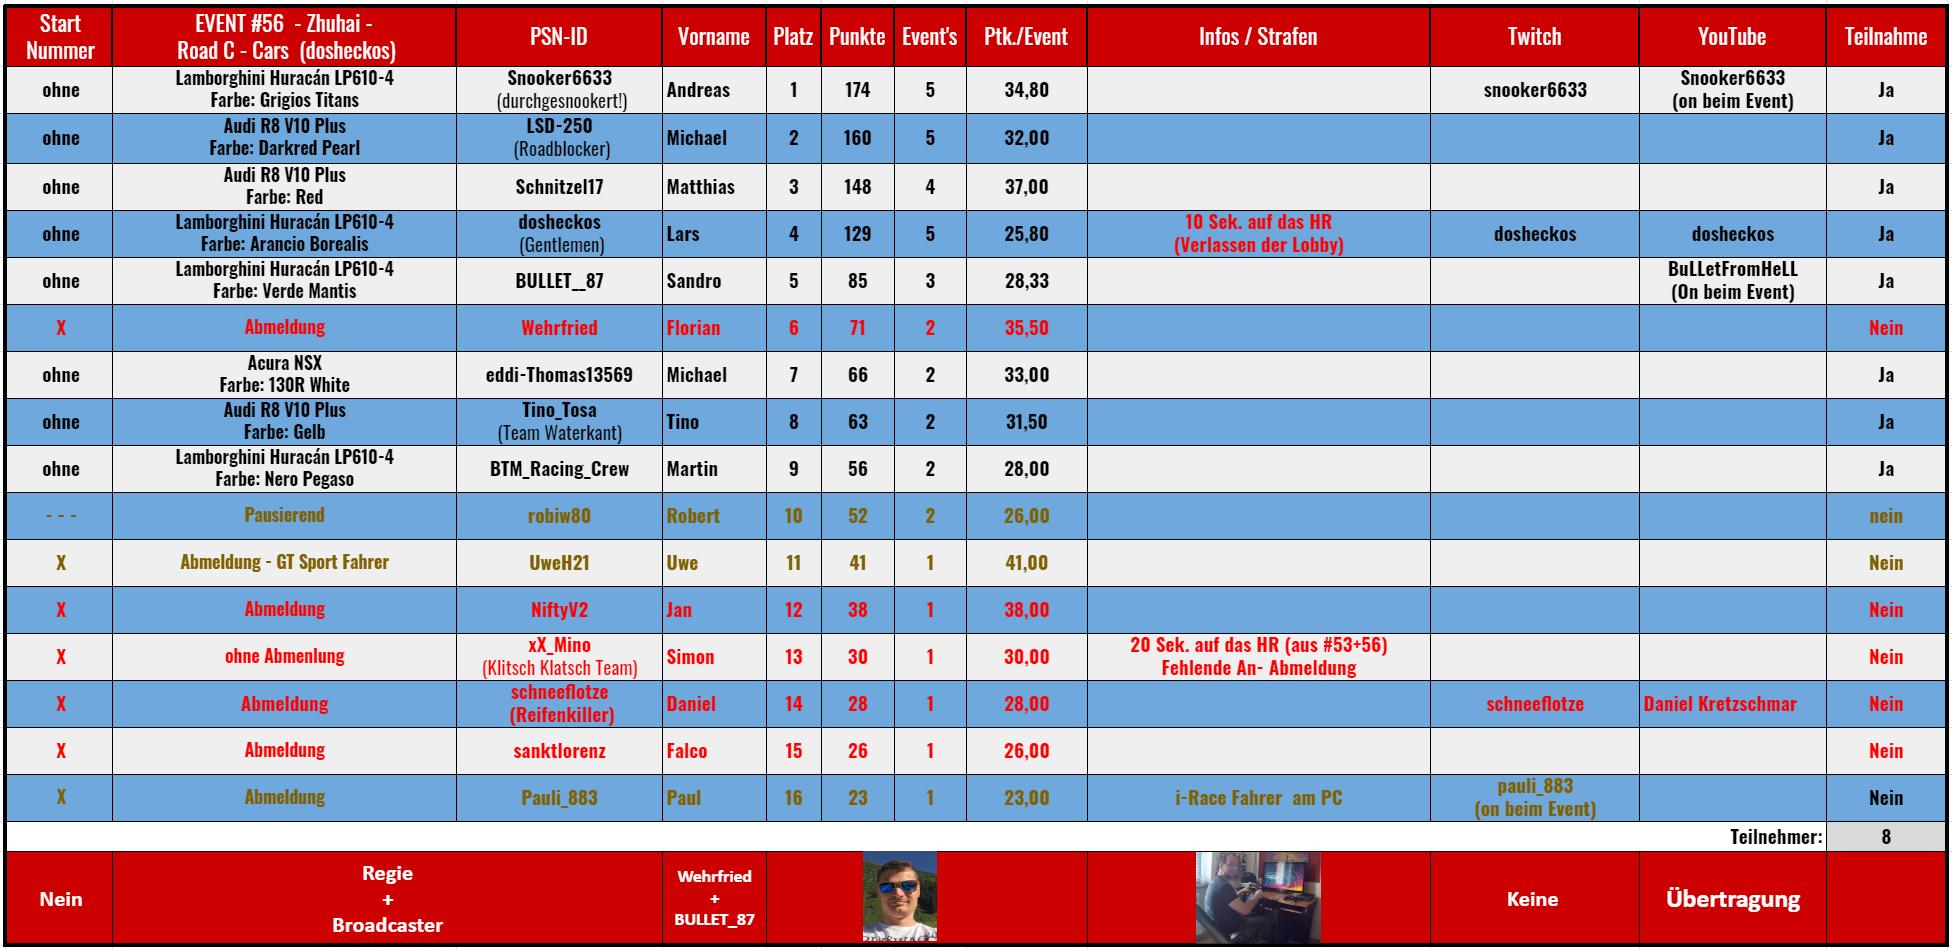 056 - Zhuhai International Circuit - Road C Klasse außer McLaren (18.04.2021) rollierende Rangliste